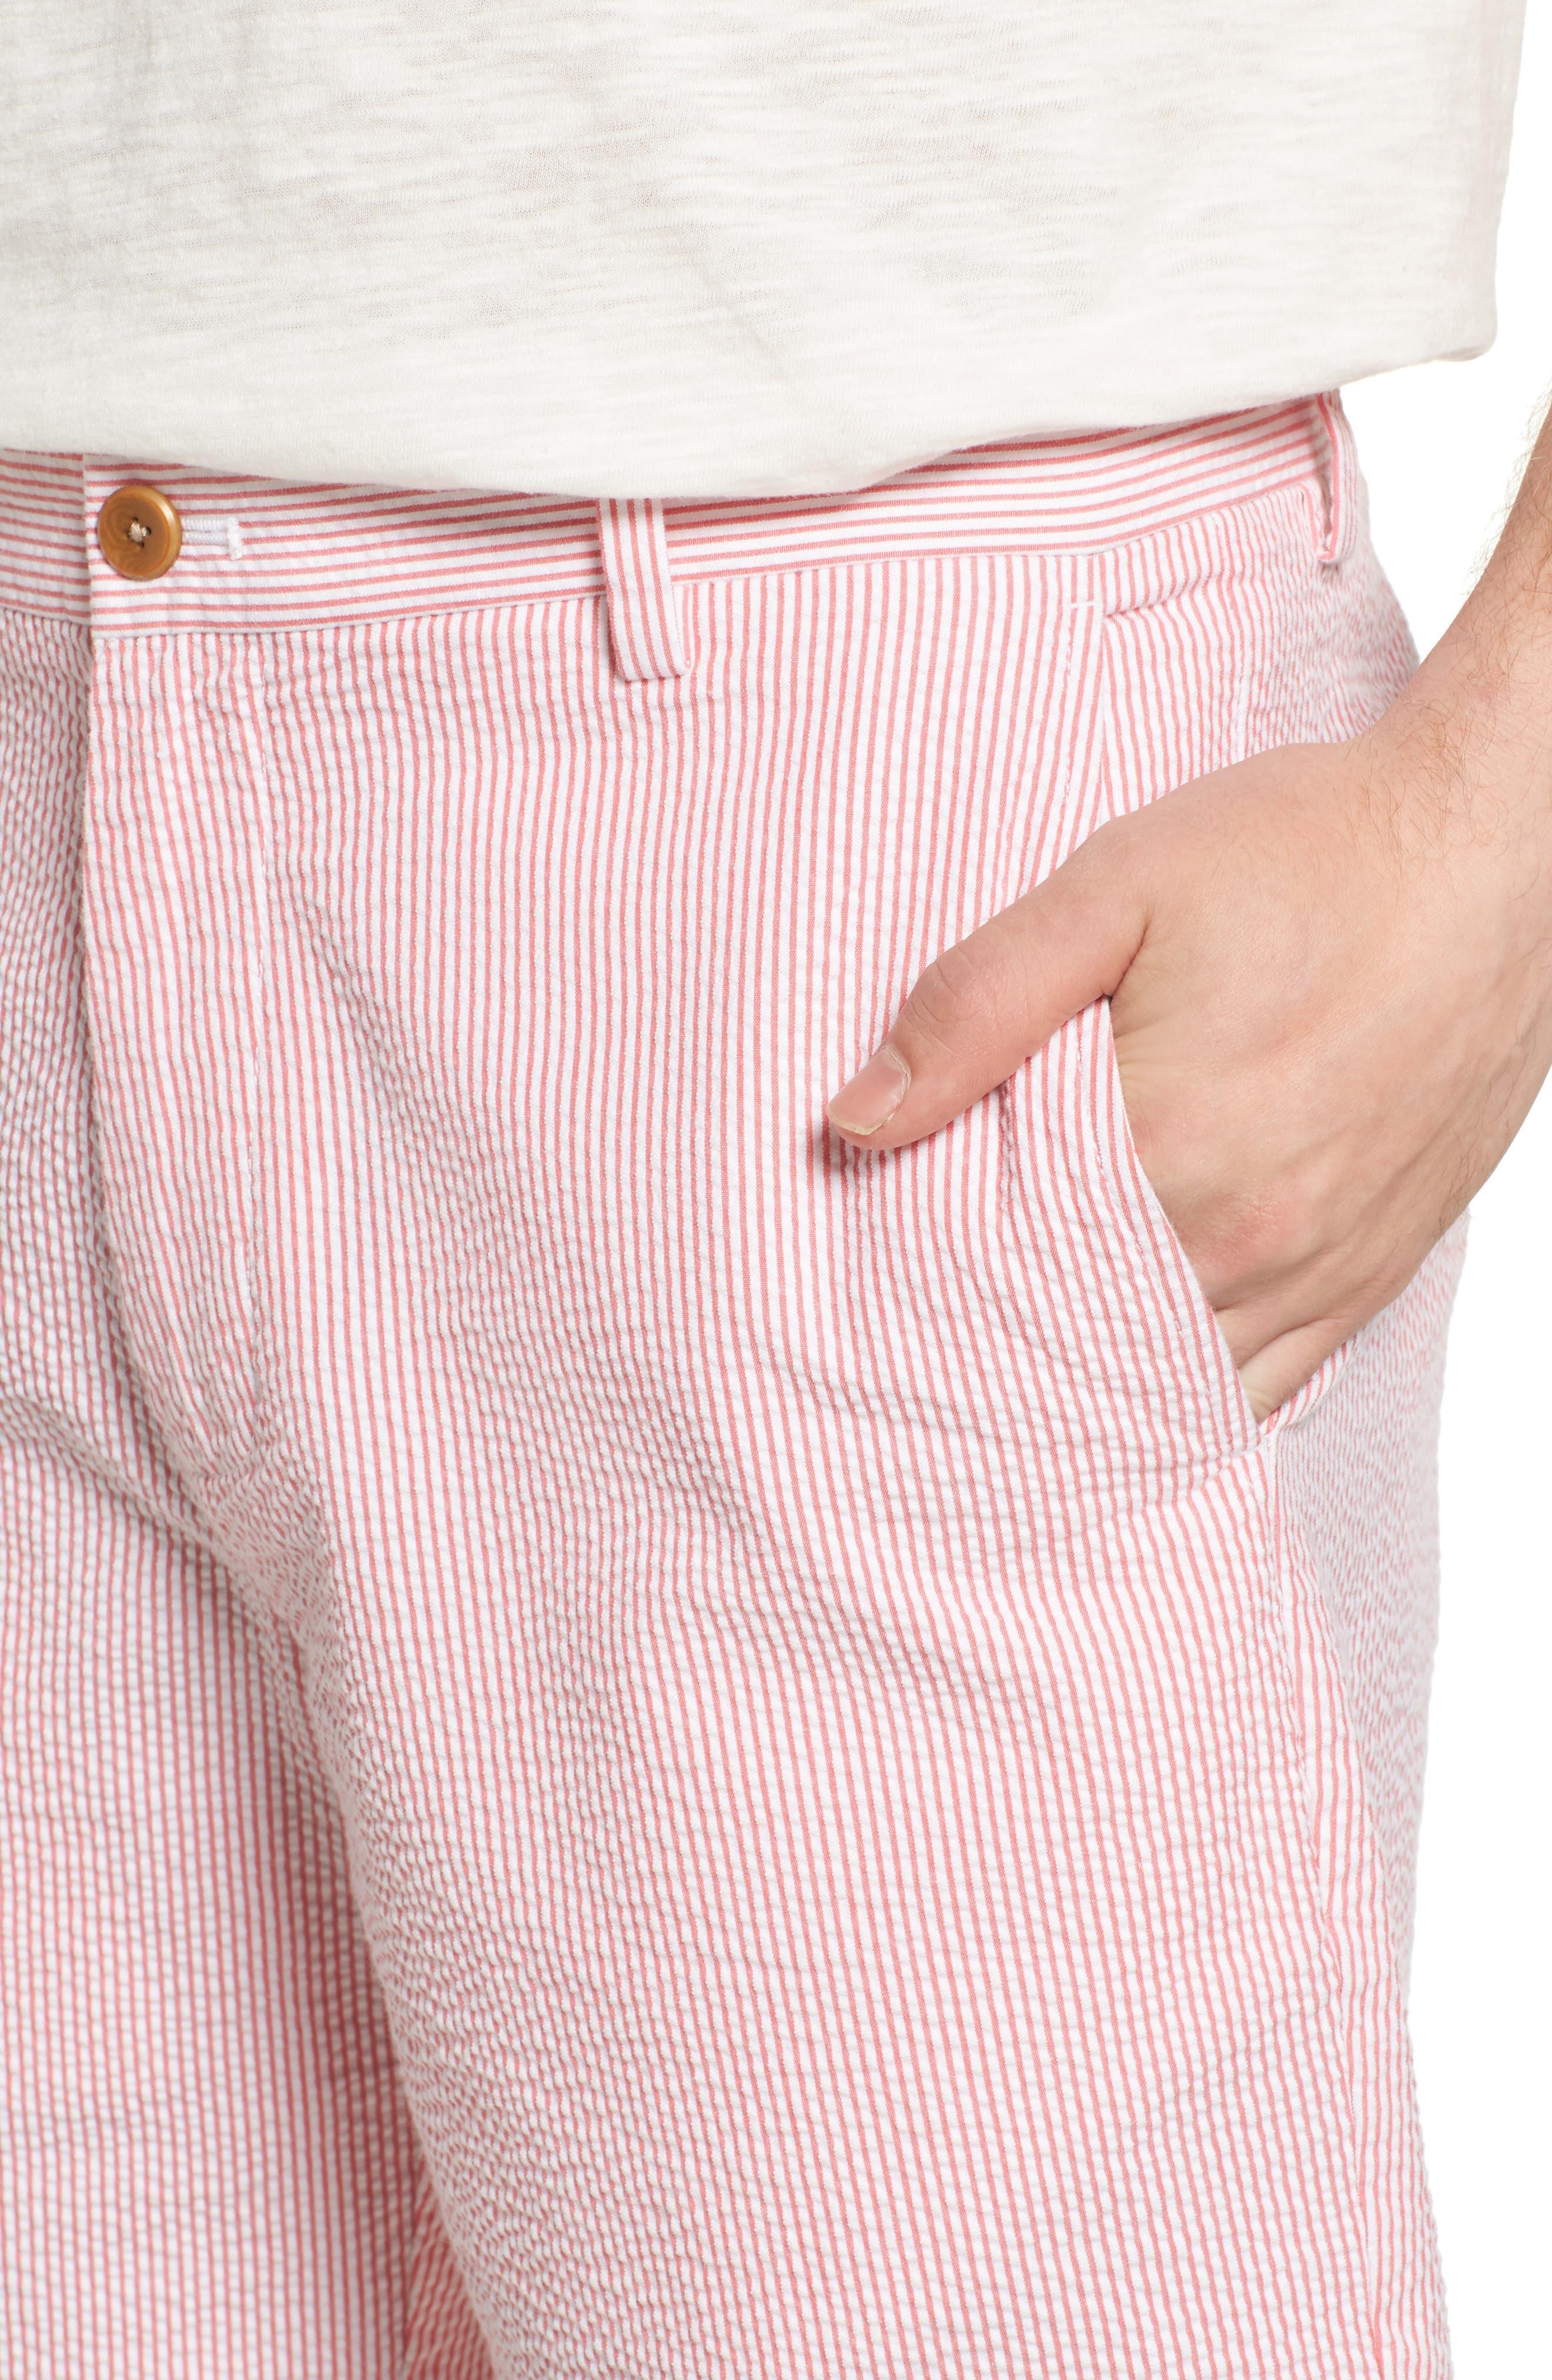 9 Inch Seersucker Shorts,                             Alternate thumbnail 8, color,